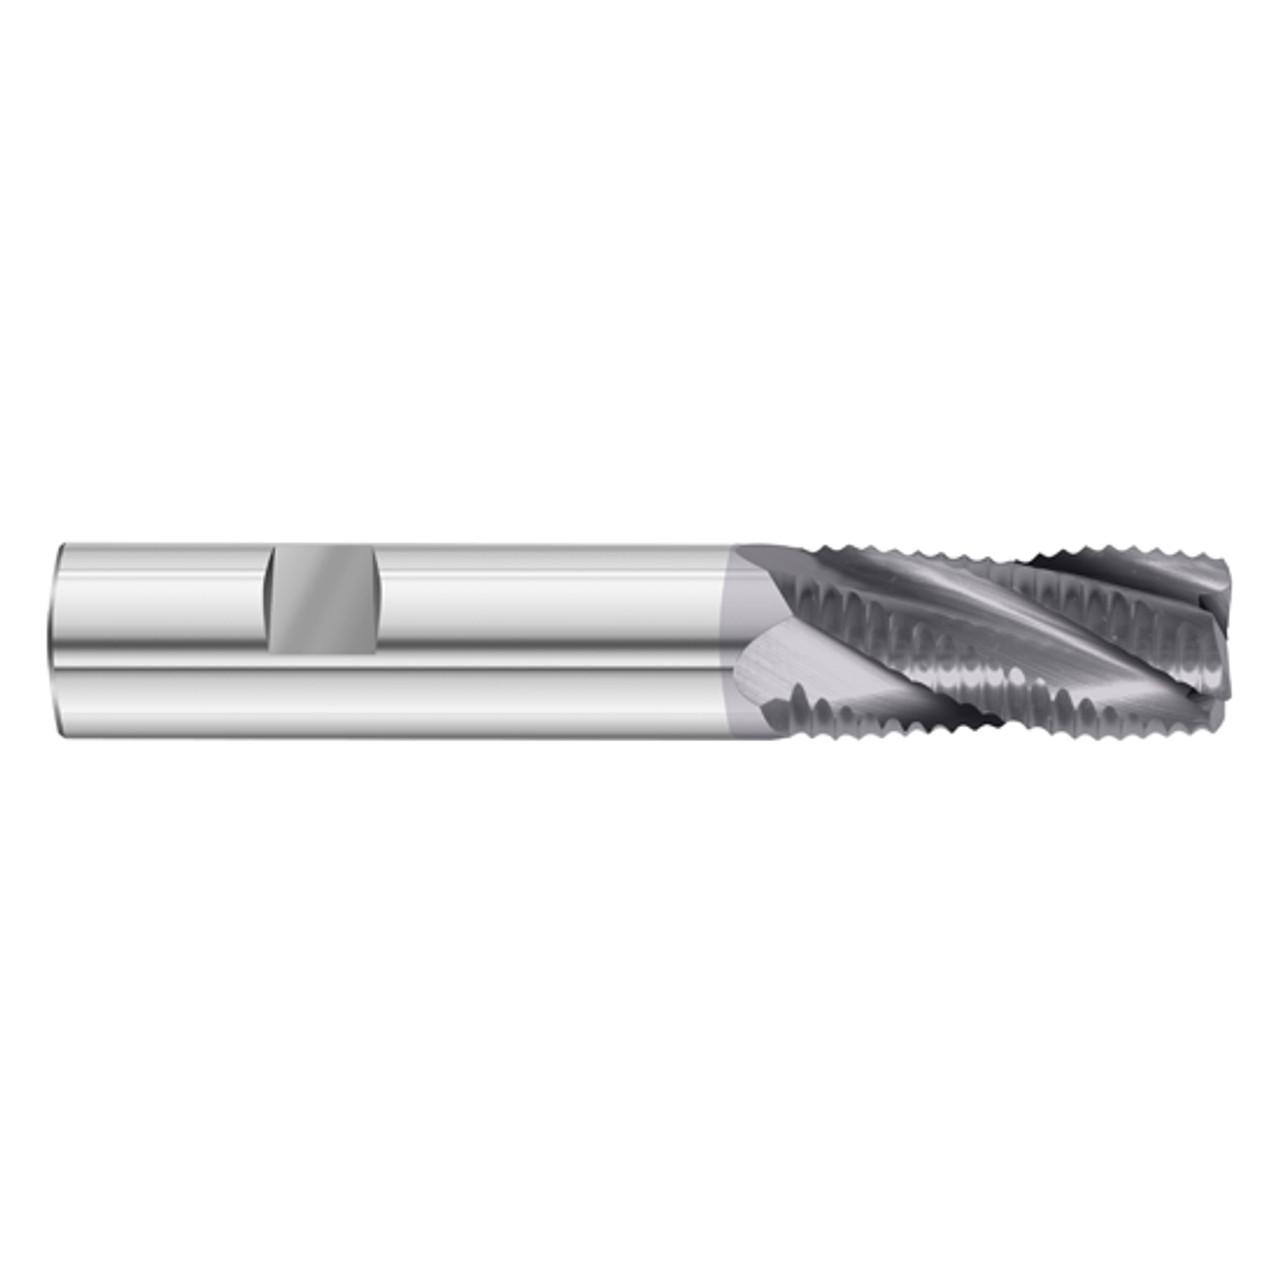 1//2 Diameter x 1//2 Shank x 1 LOC x 3 OAL 4 Flute TiAlN Solid Carbide Radius End Mill Fullerton Tool 33809